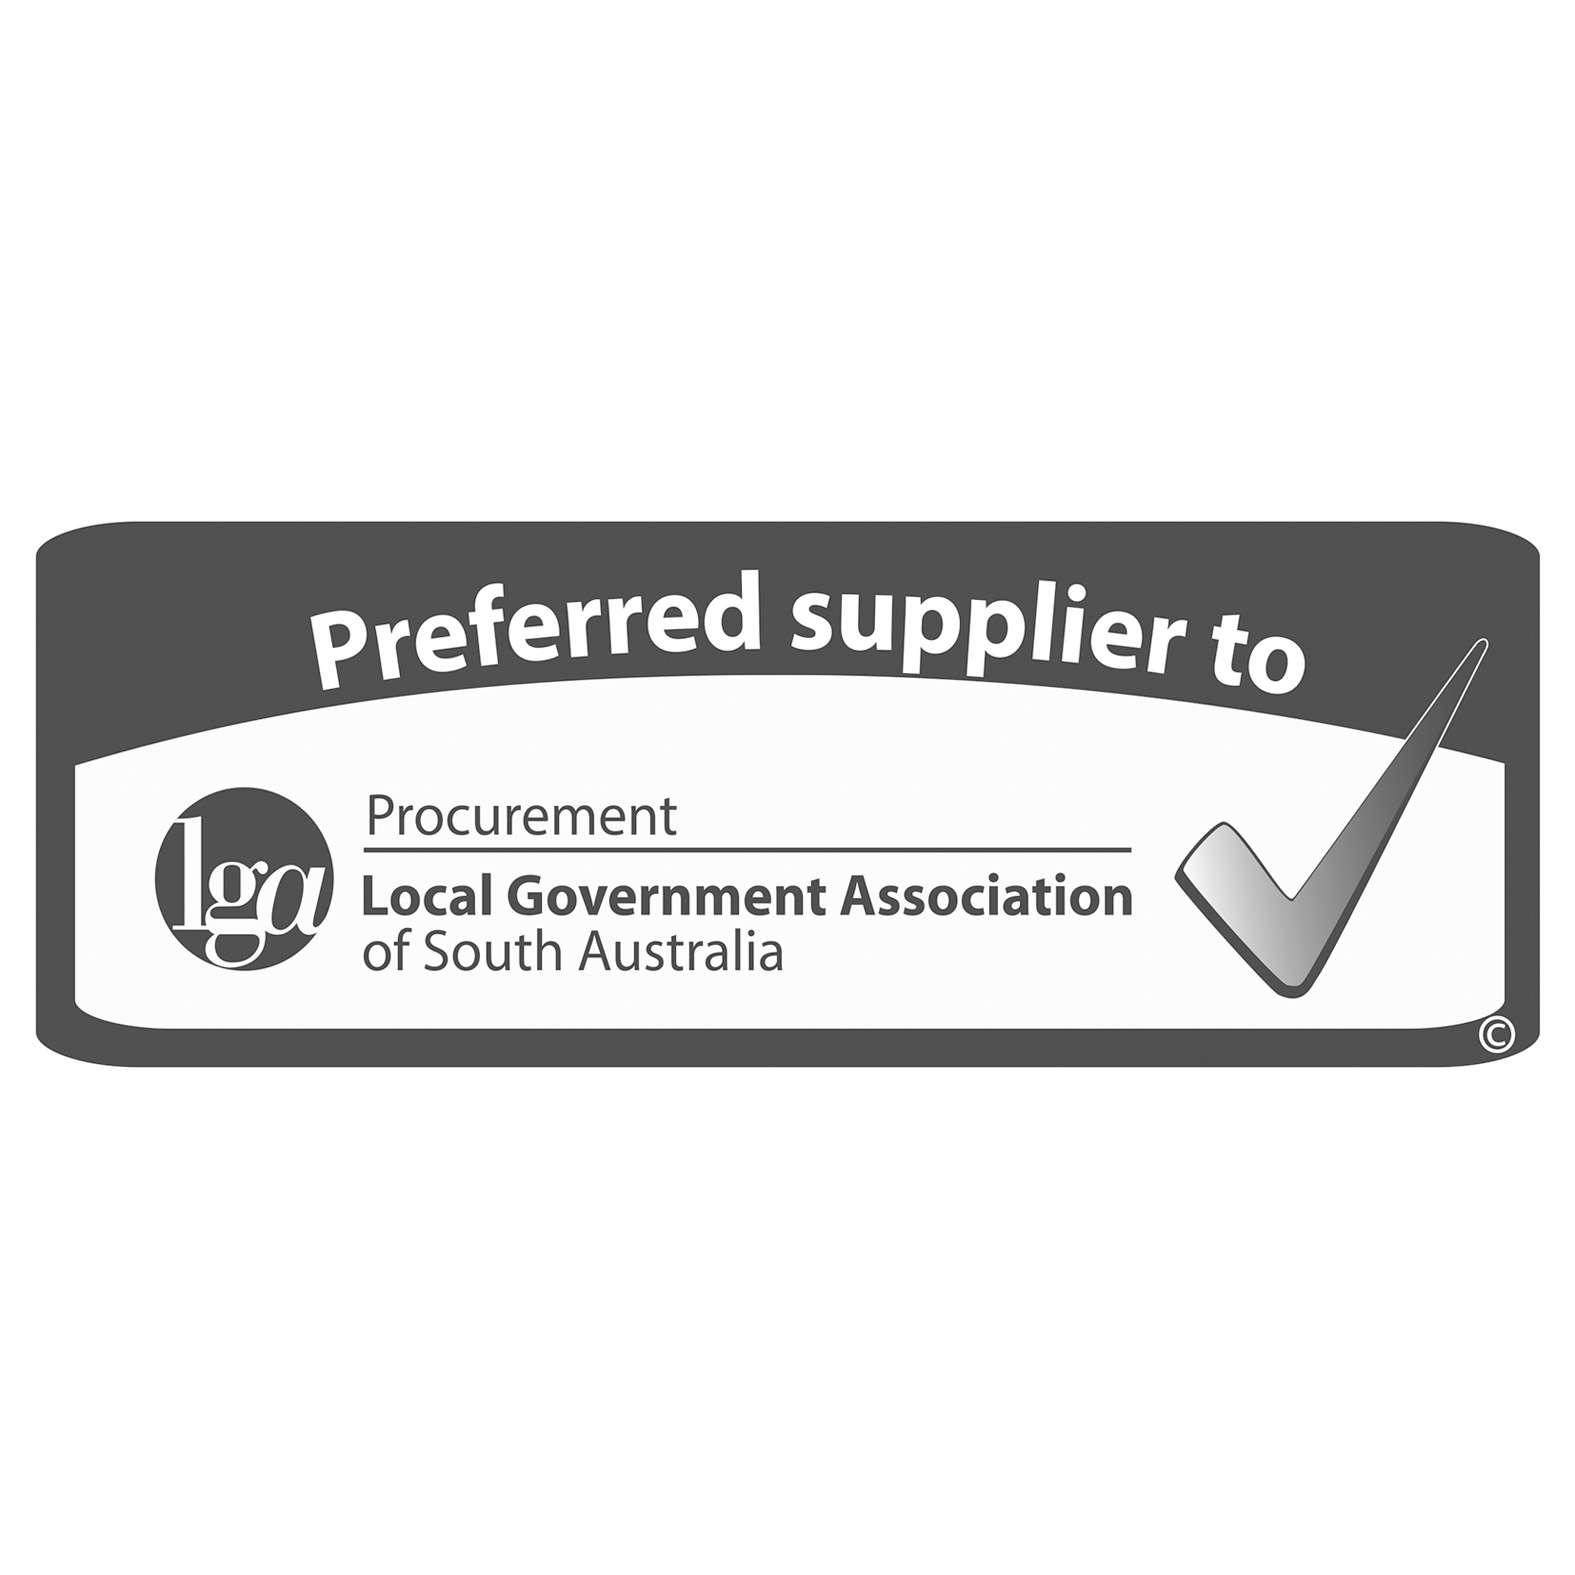 lga south australia preferred supplier safety wholesale ppe